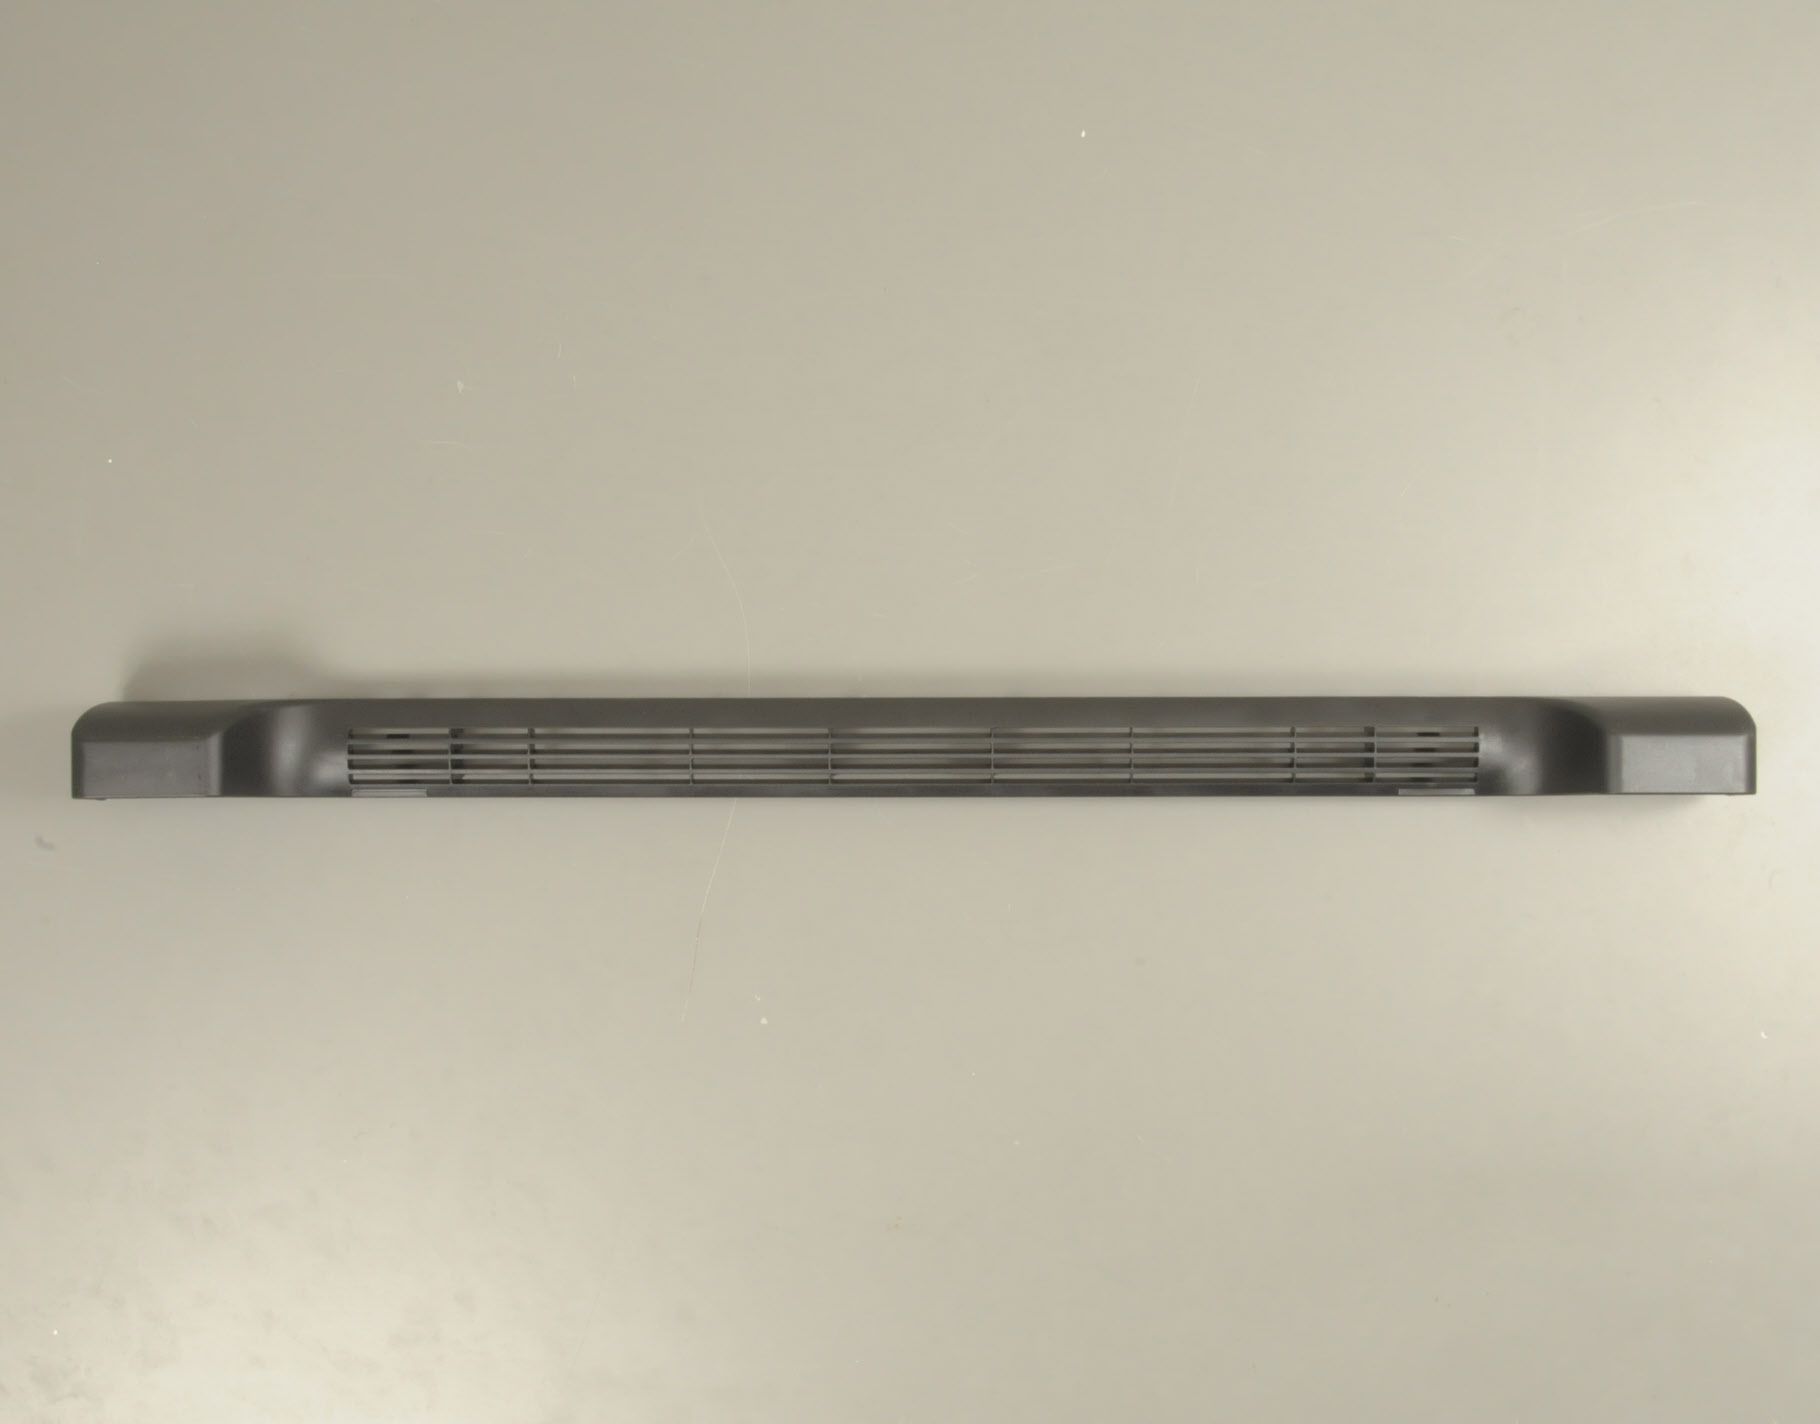 WPW10131134 KitchenAid Refrigerator Part -Toe Kick Plate